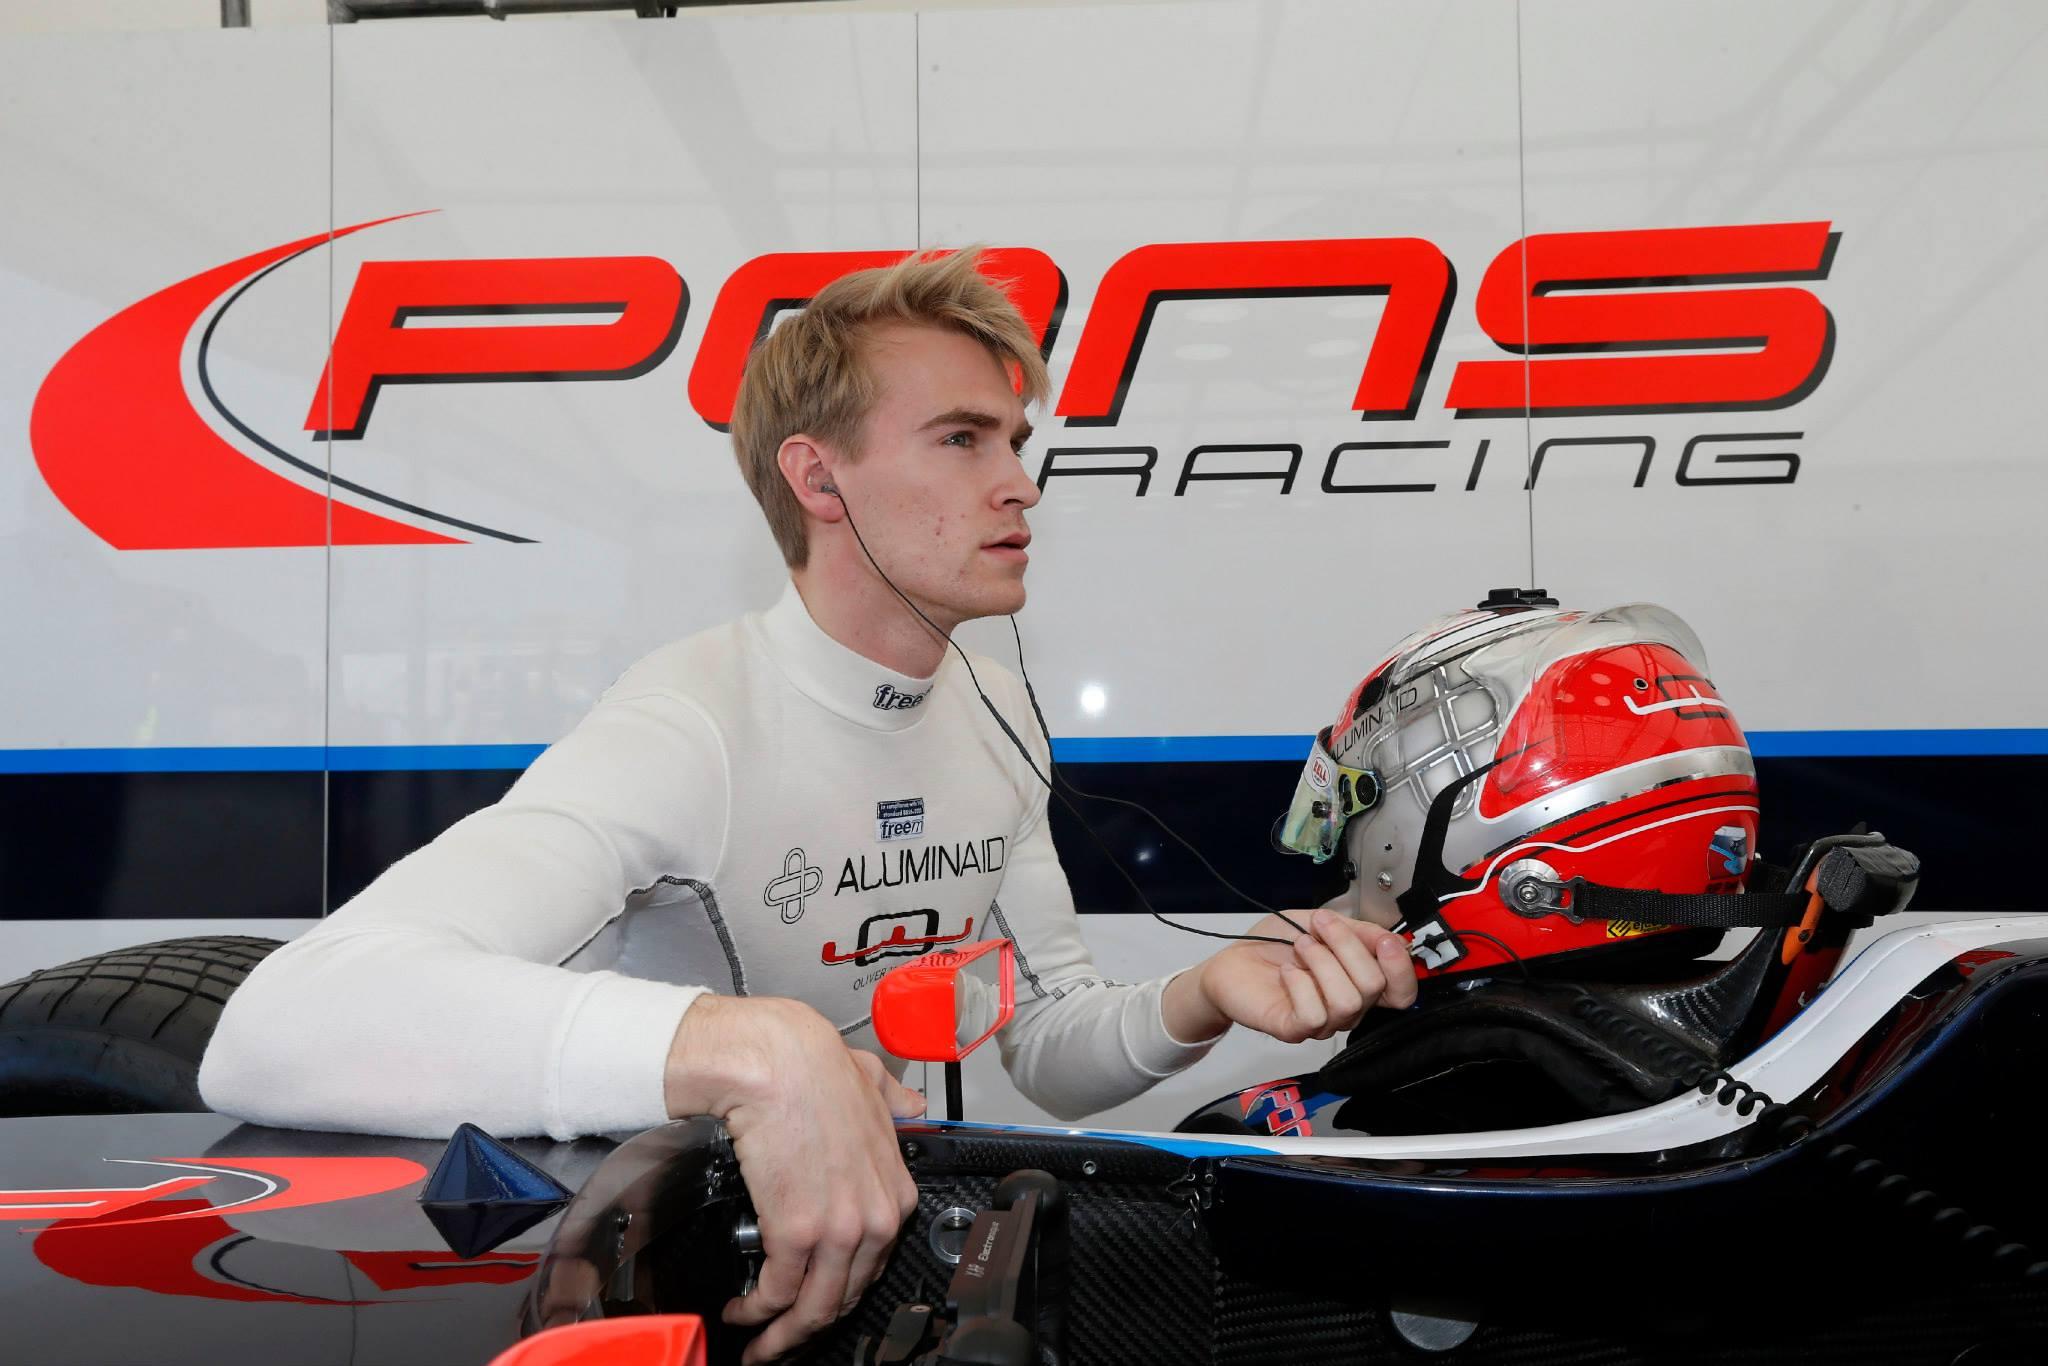 2014 Formula Renault 3.5 Series – Monza – Oliver Rowland